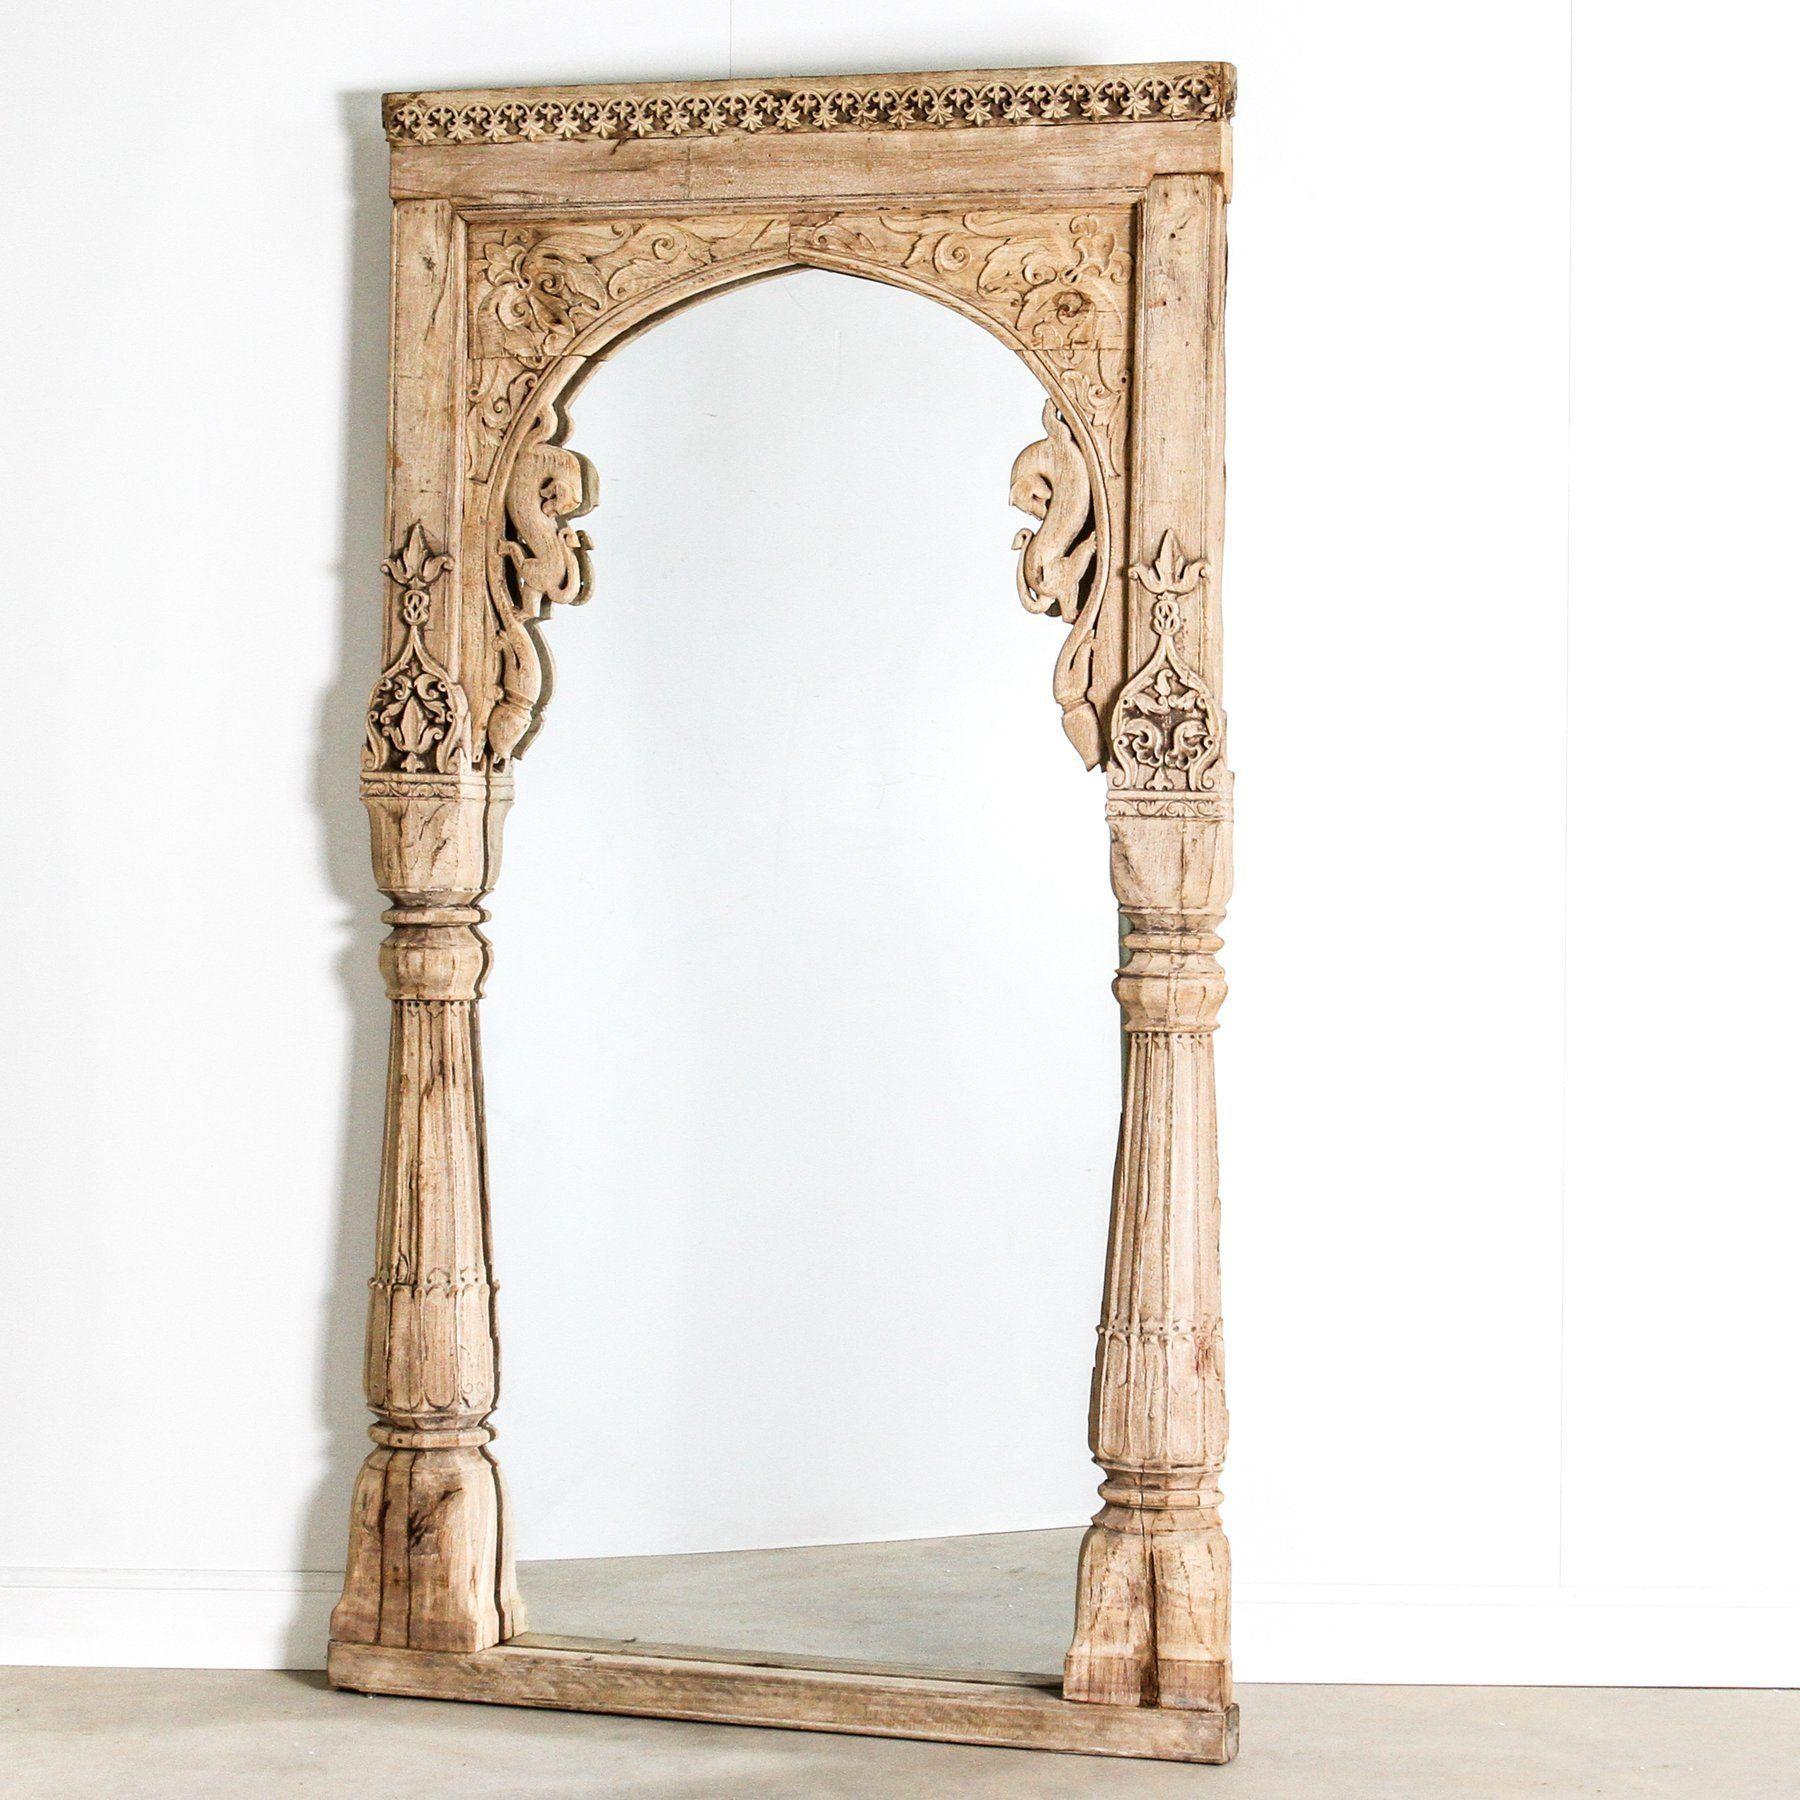 Vintage Indian Archway Mirror in 2020 | Mirror, Mirror ...